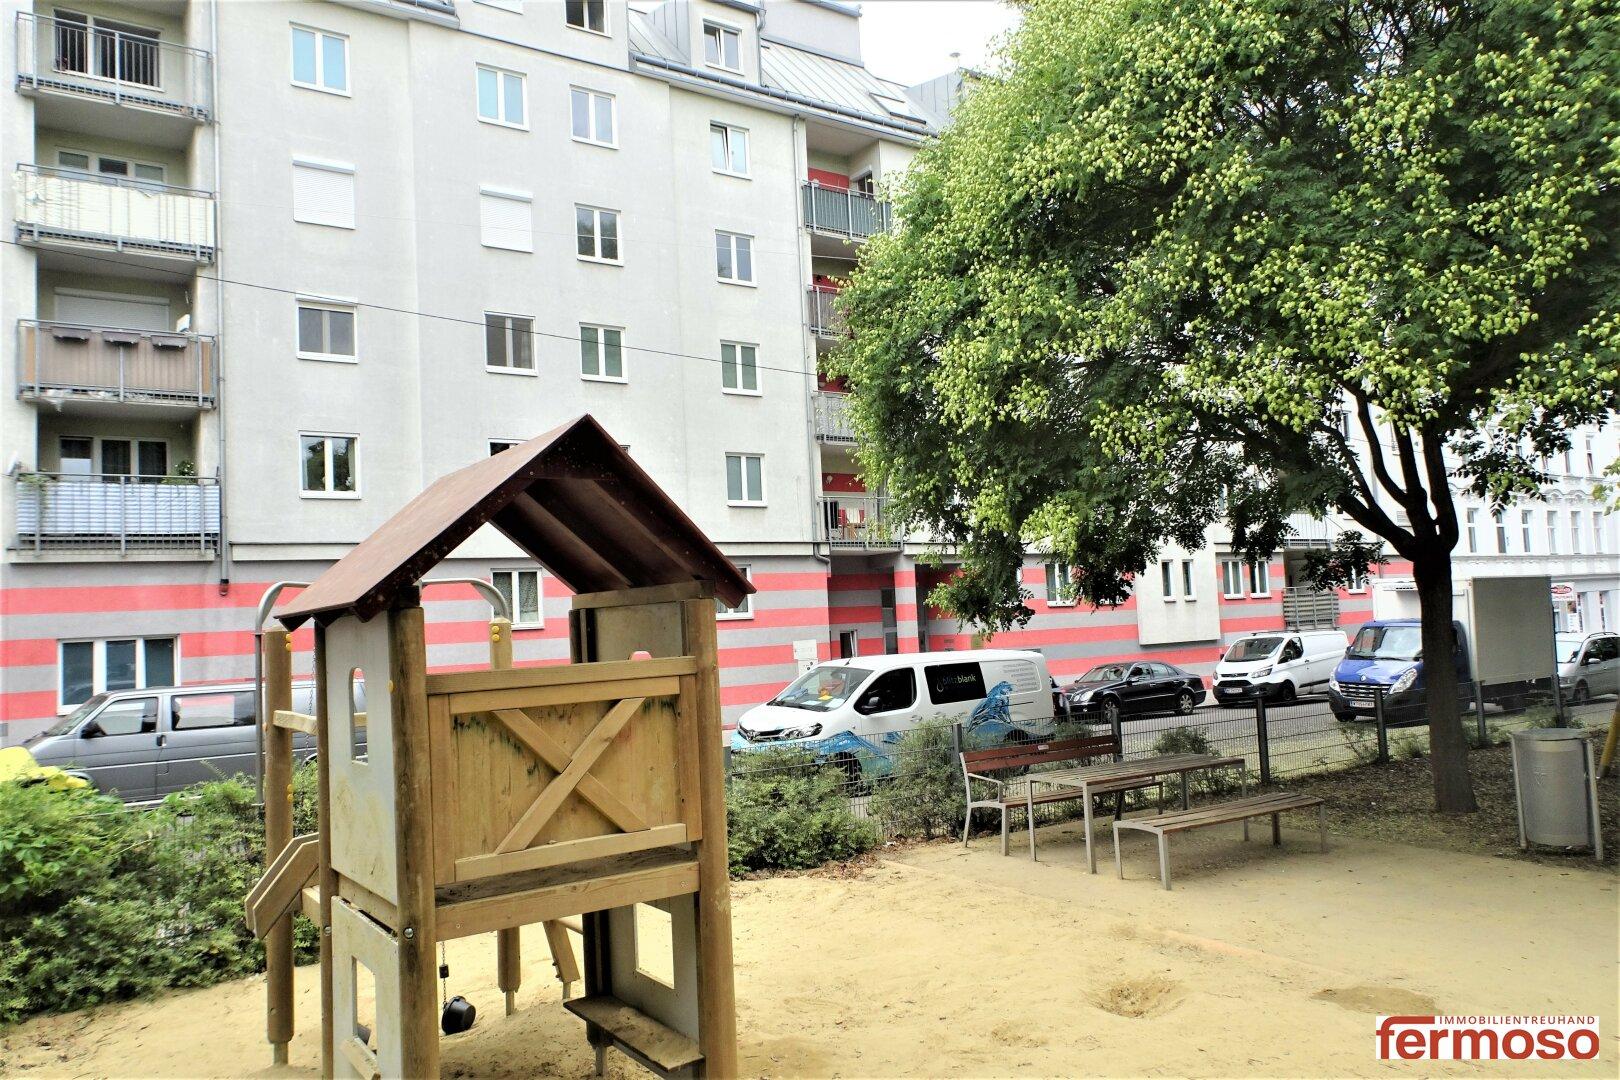 Laubeplatz